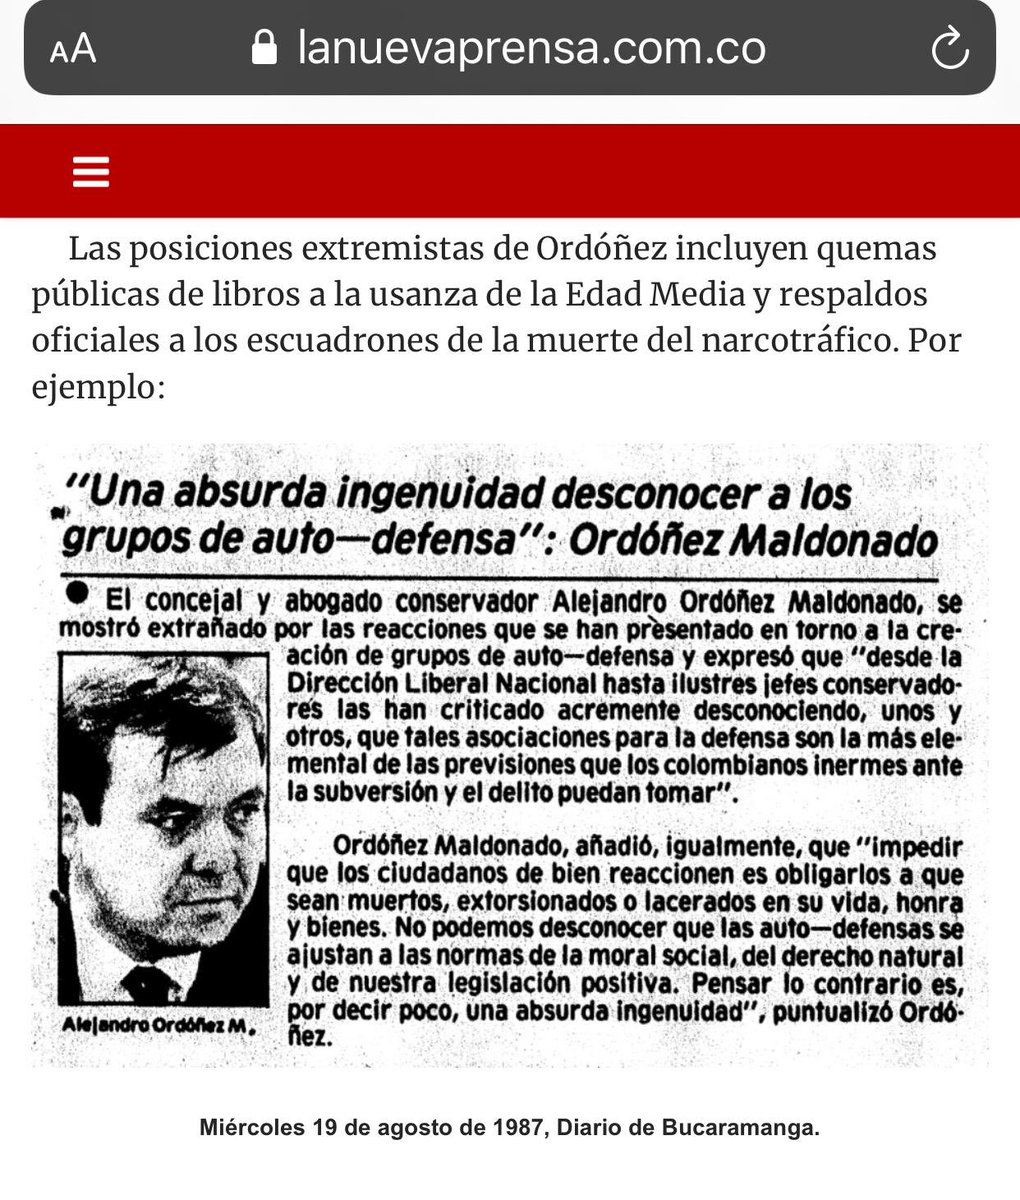 Noticias y  Generalidades - Página 10 EgWoLaIX0AQ5L-G?format=jpg&name=medium